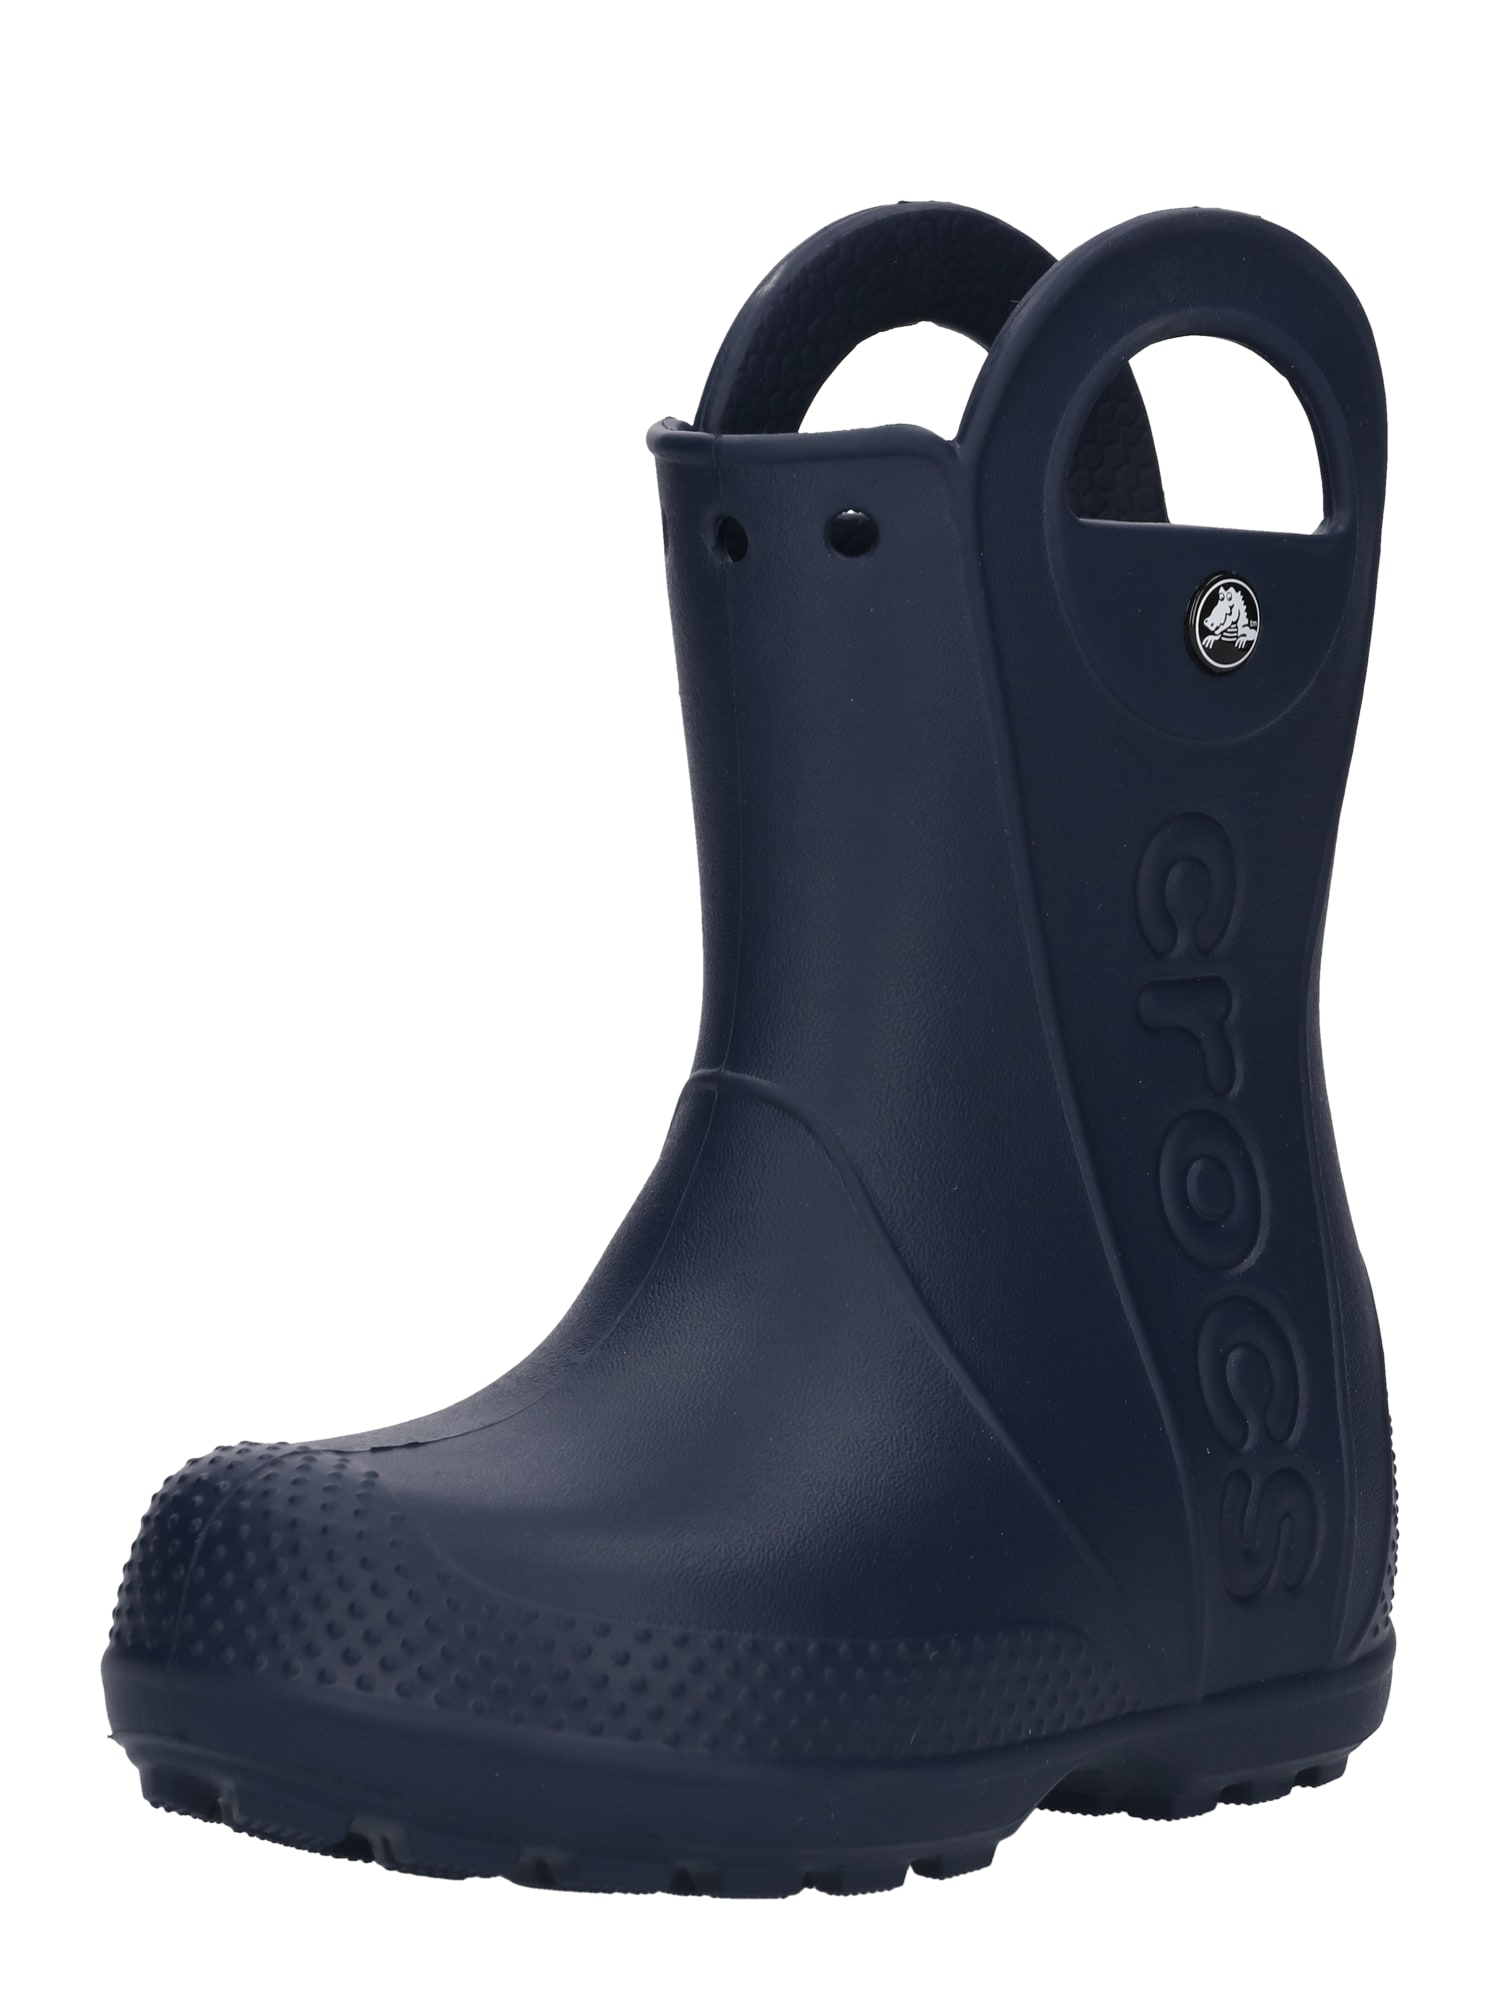 Gumové holínky Handle It Rain námořnická modř Crocs